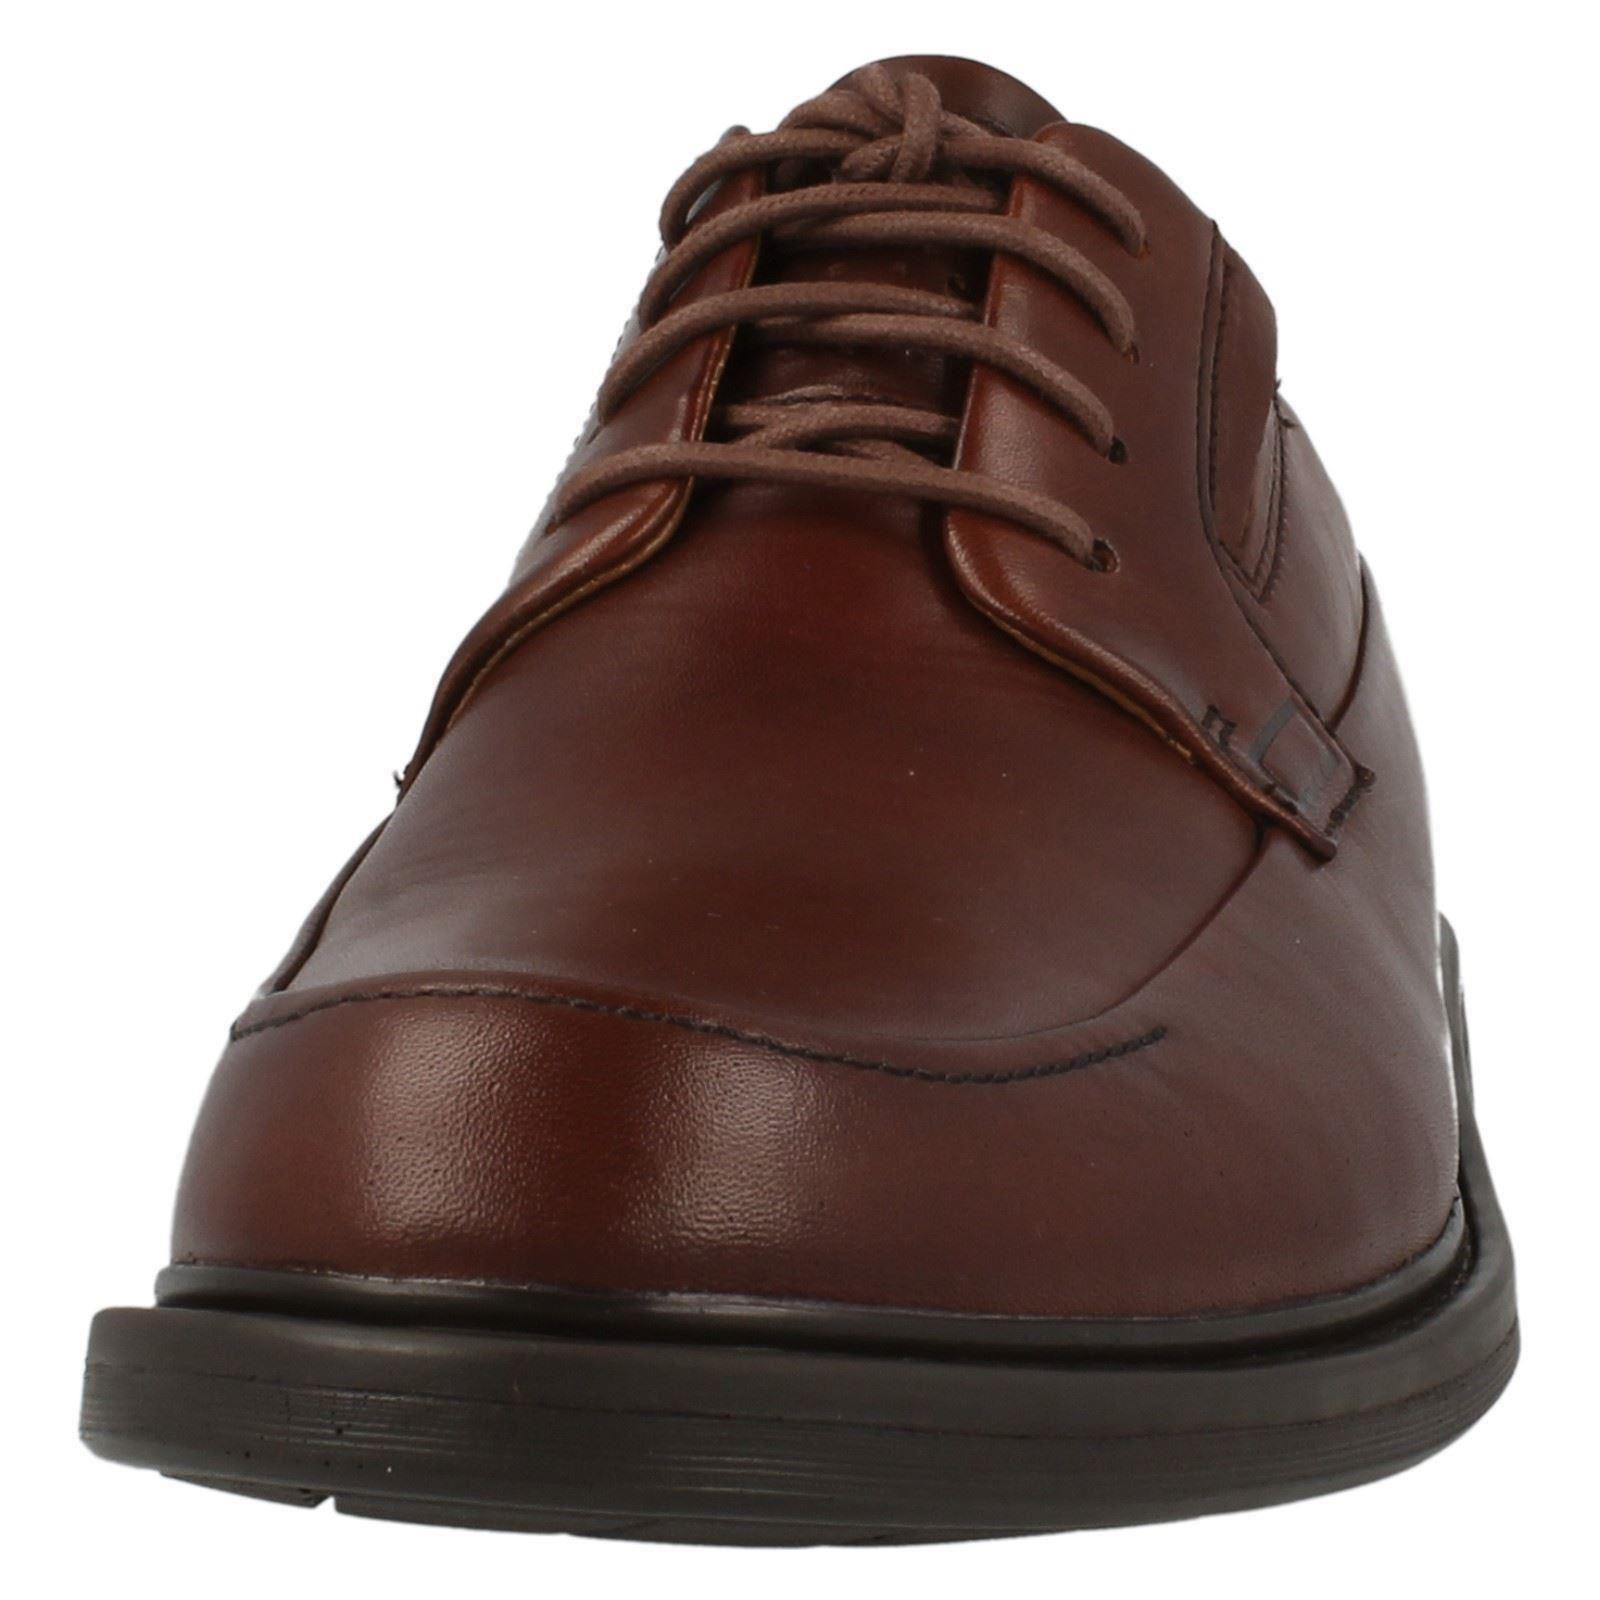 Mens Clarks Formal Lace Up Shoes Drexlar Time